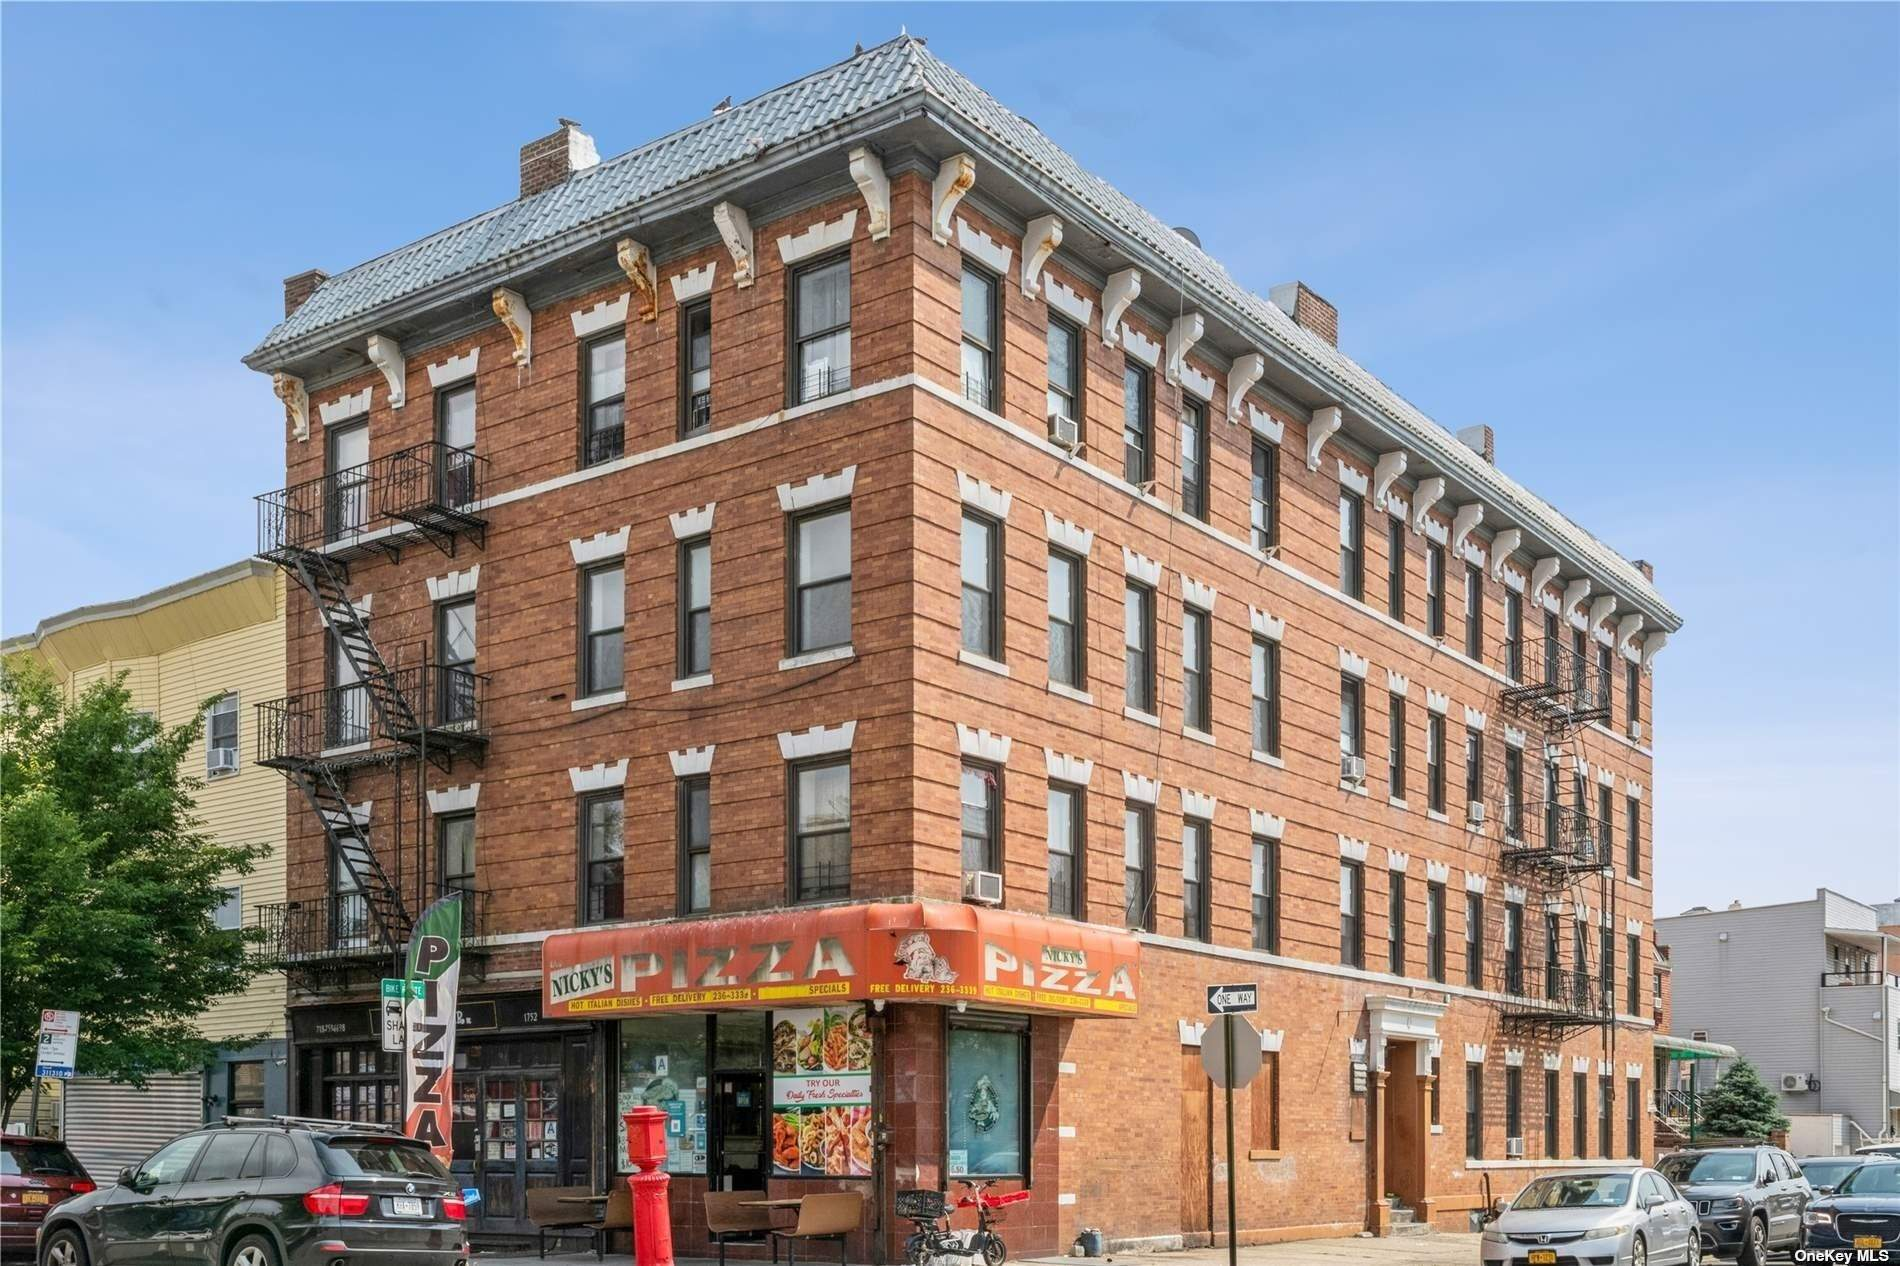 171 BAY 17 STREET, BENSONHURST, NY 11214